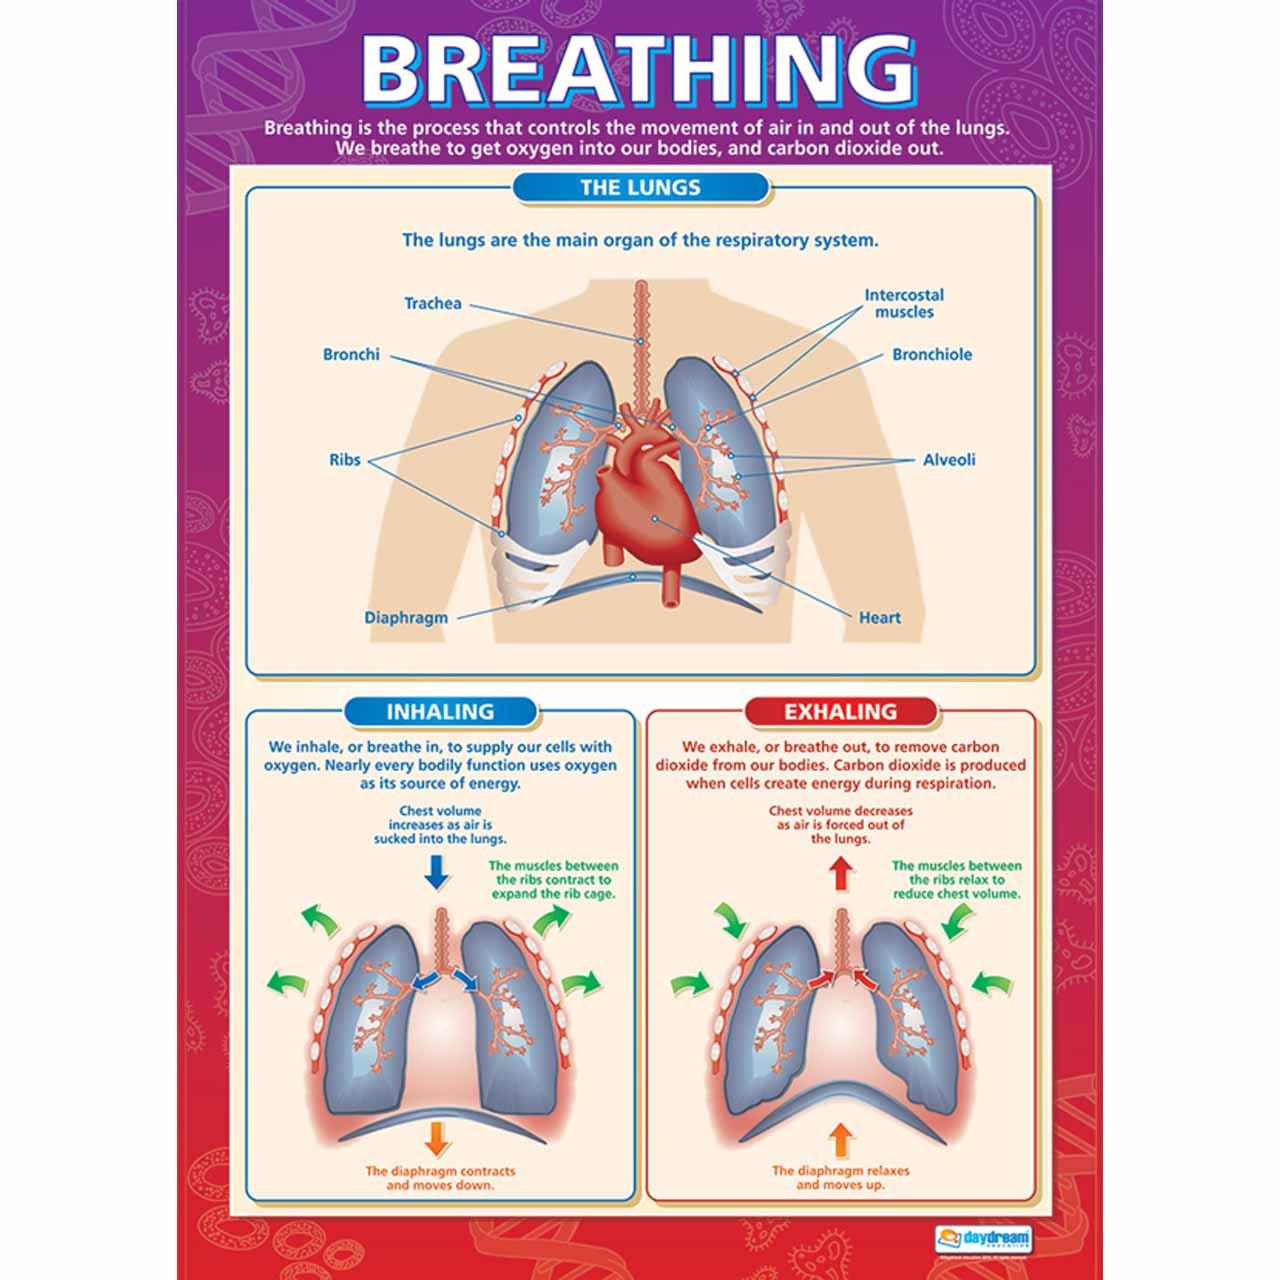 SC004L - Breathing Laminated